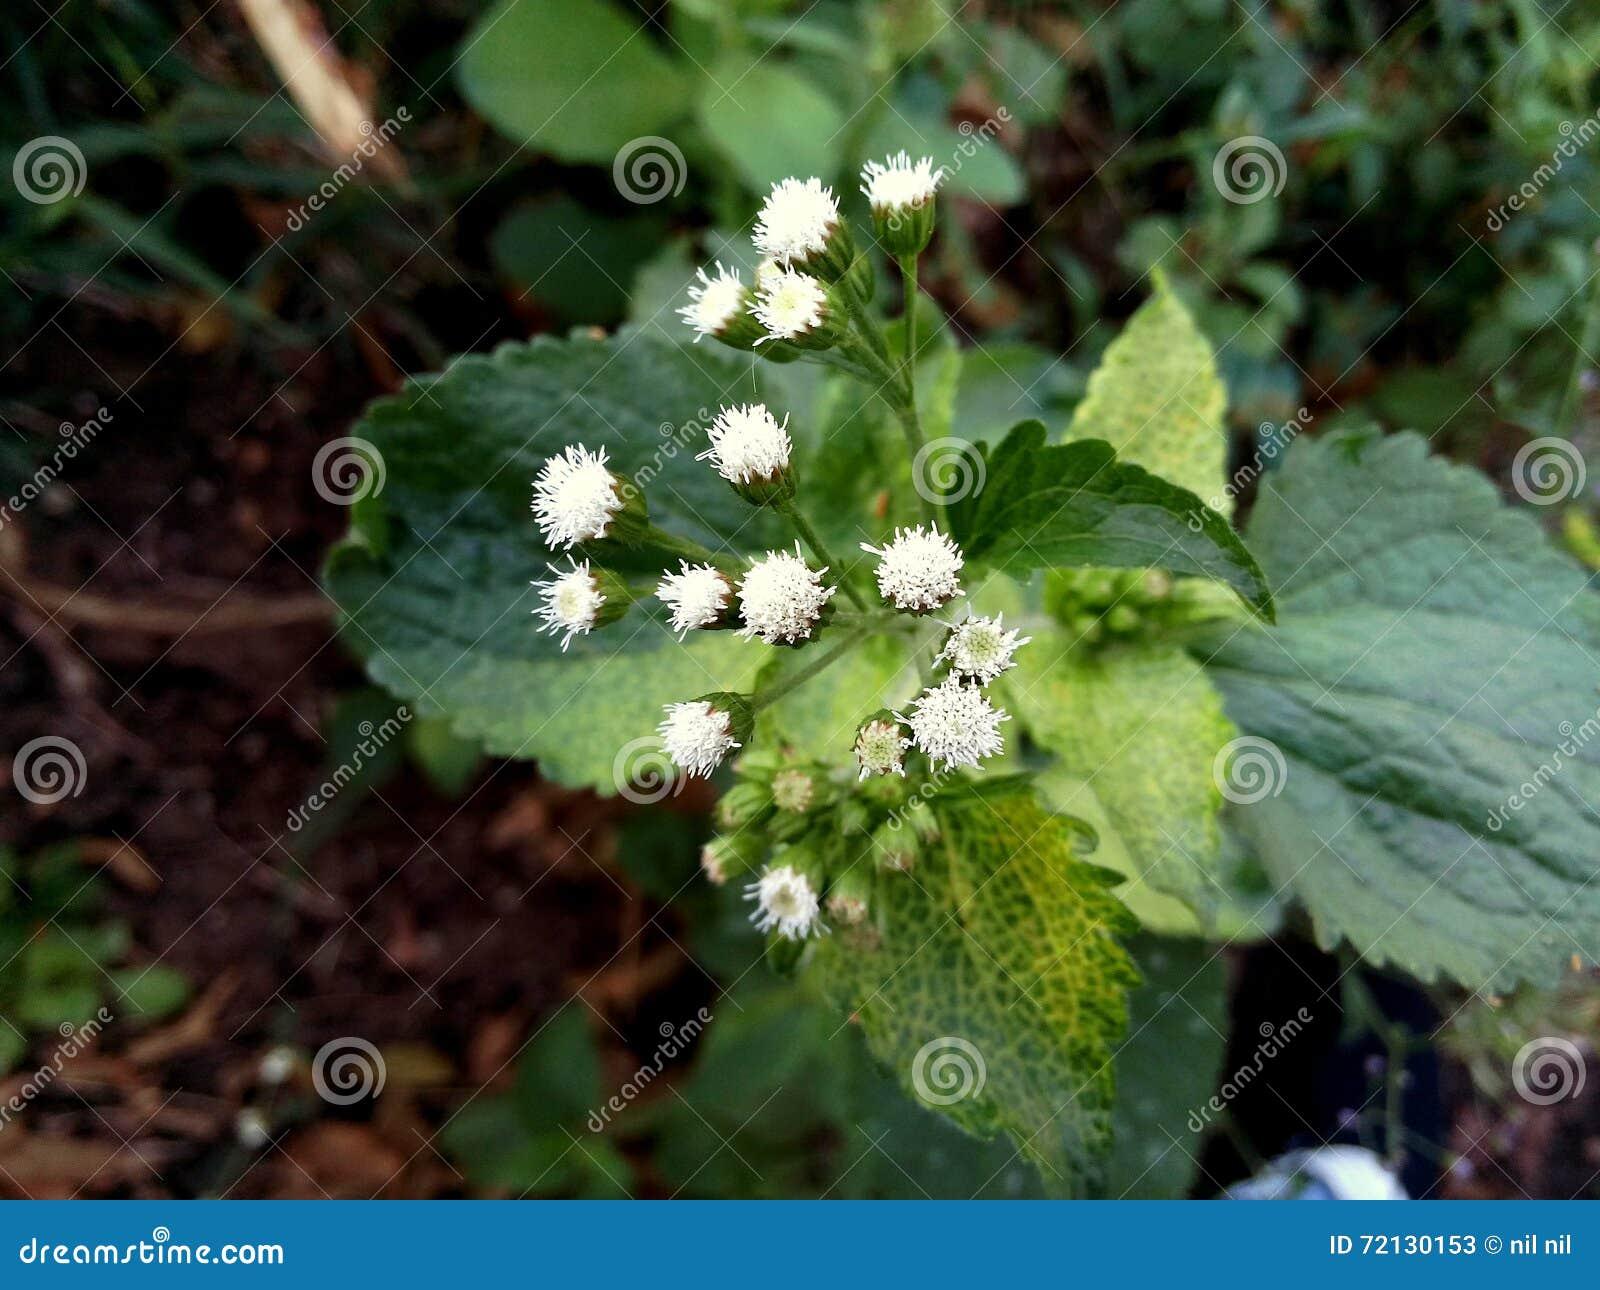 Rare White Flowers Stock Image Image Of Wild Nature 72130153